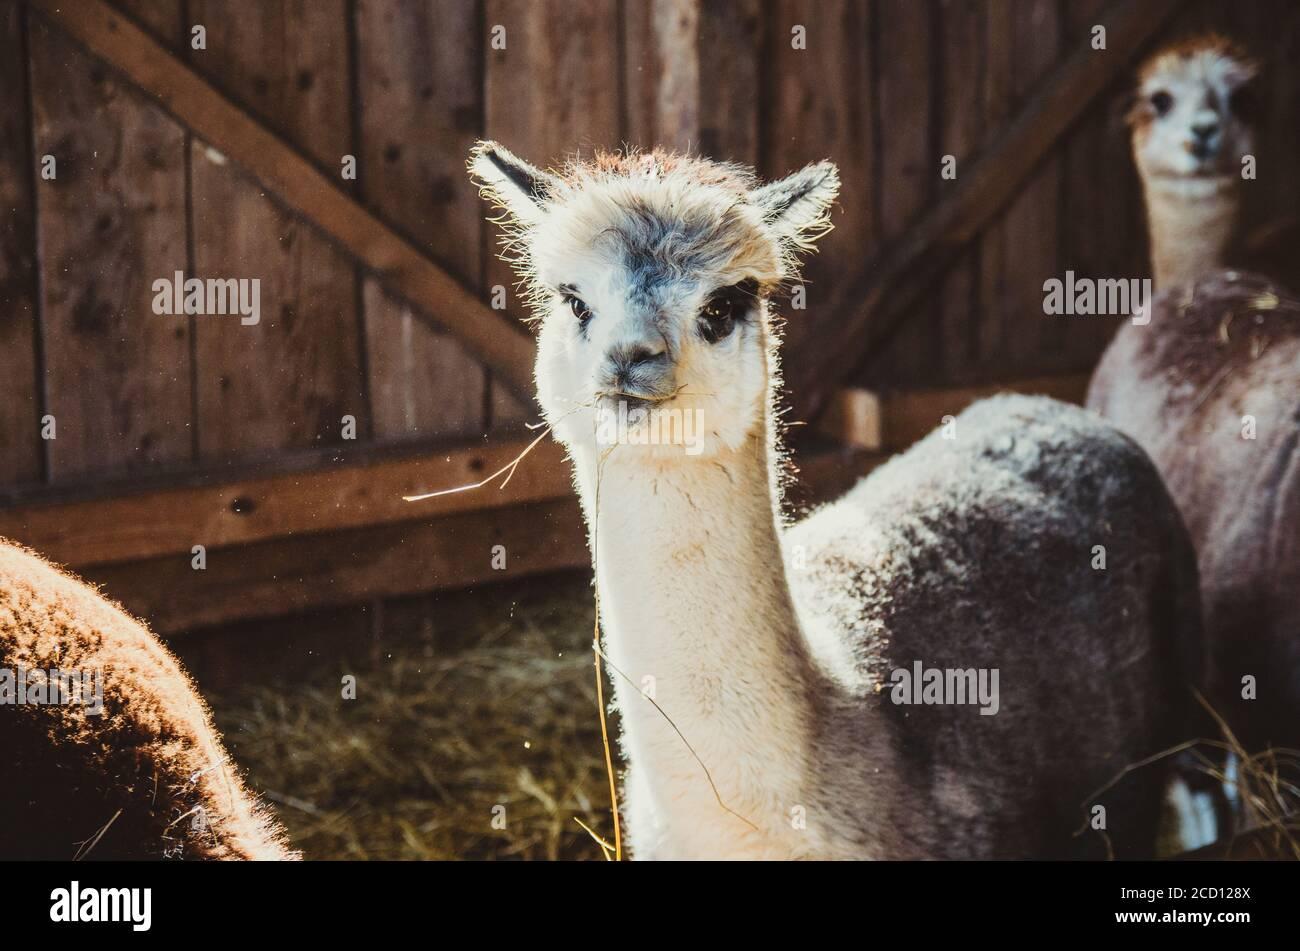 Cute alpaca in the barn eating hay Stock Photo